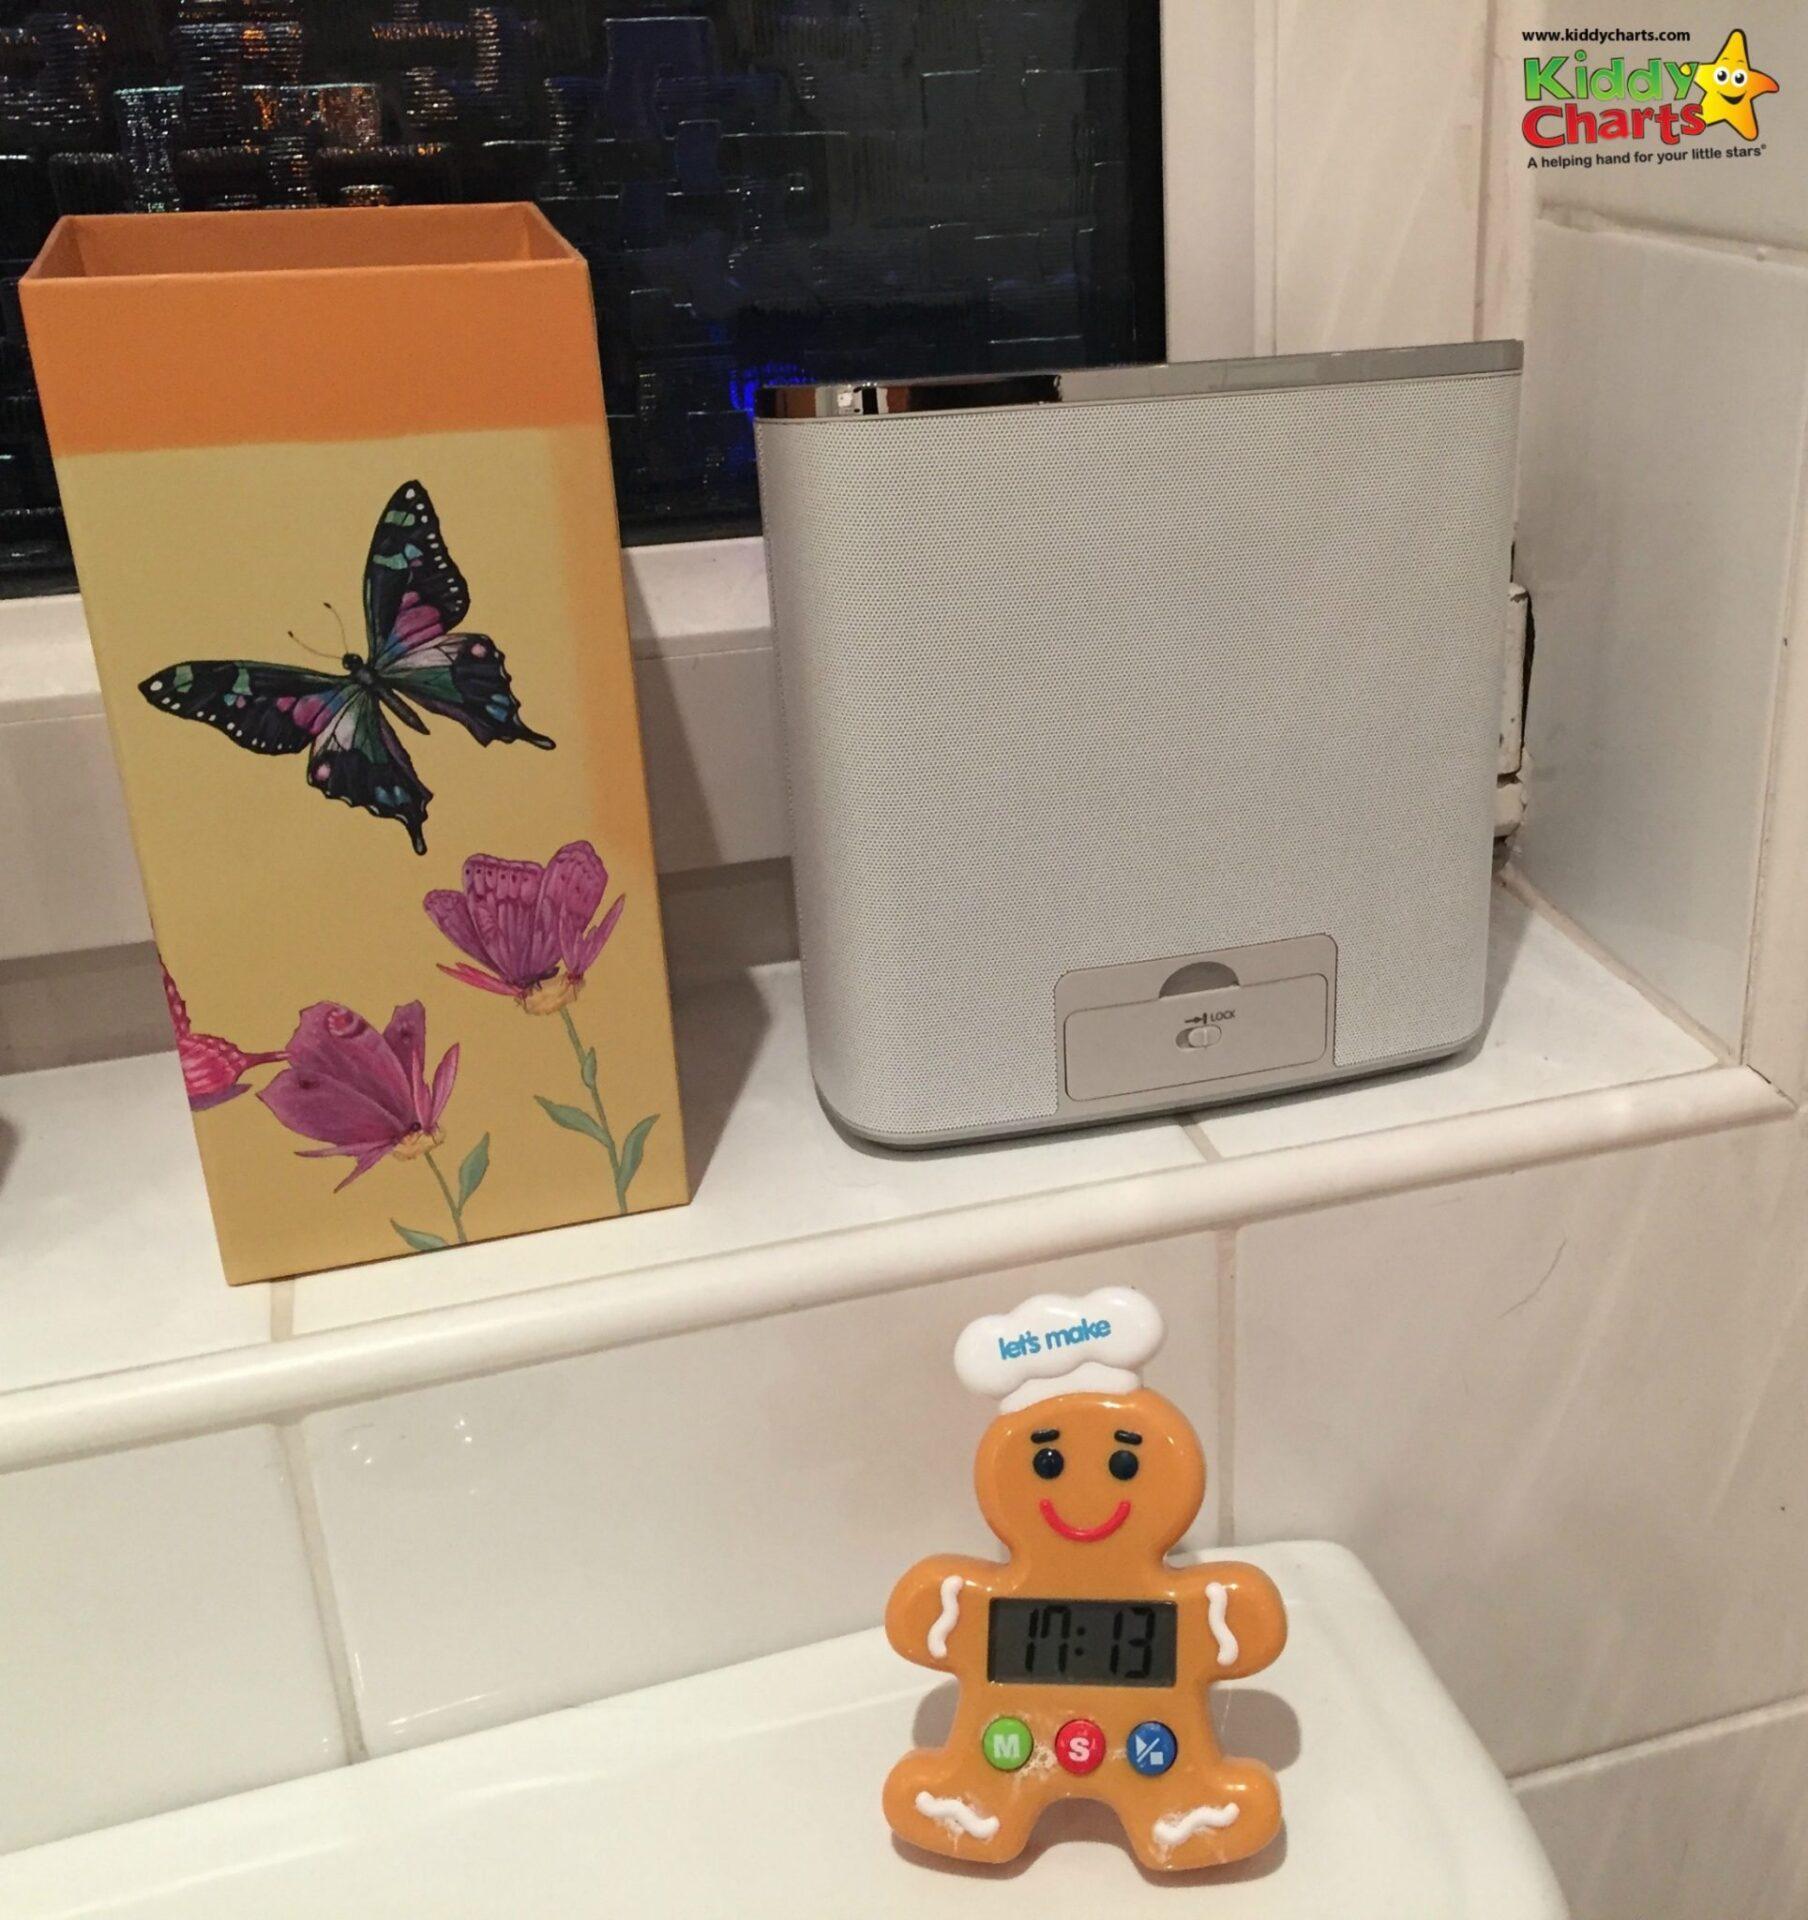 Panasonic waterproof portable speakers - in its place!